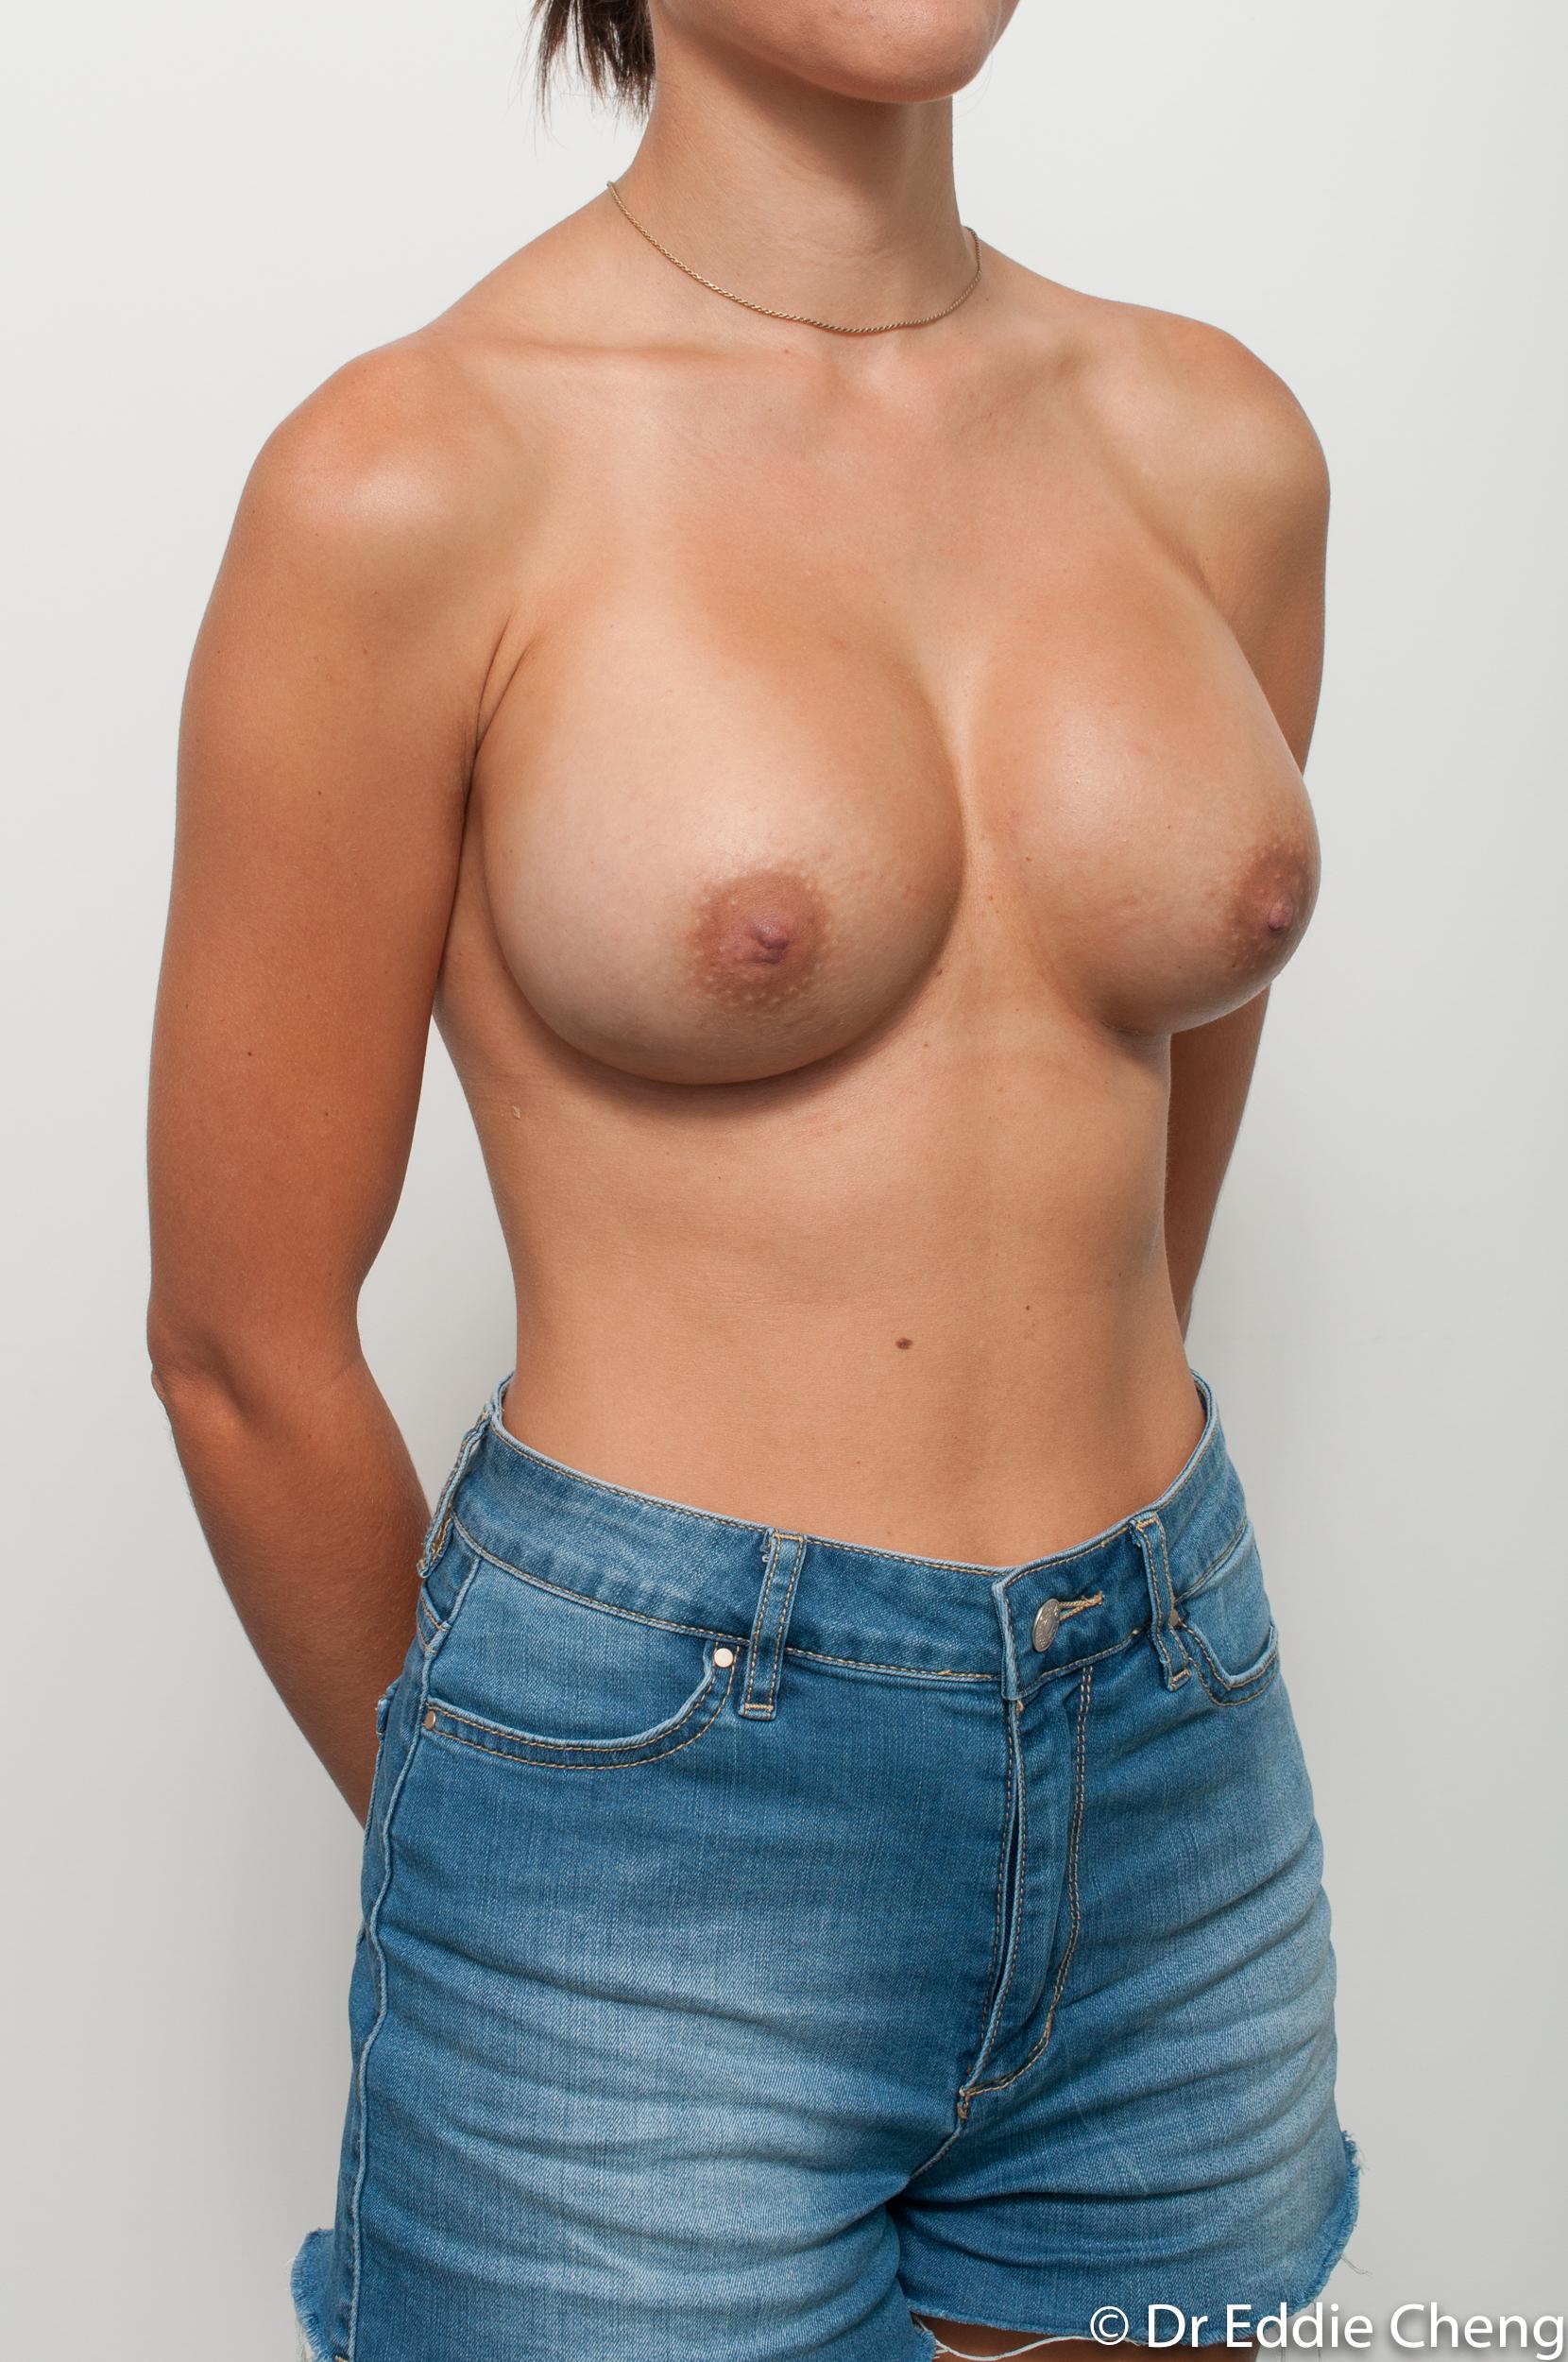 breast implant revision dr eddie cheng brisbane-7